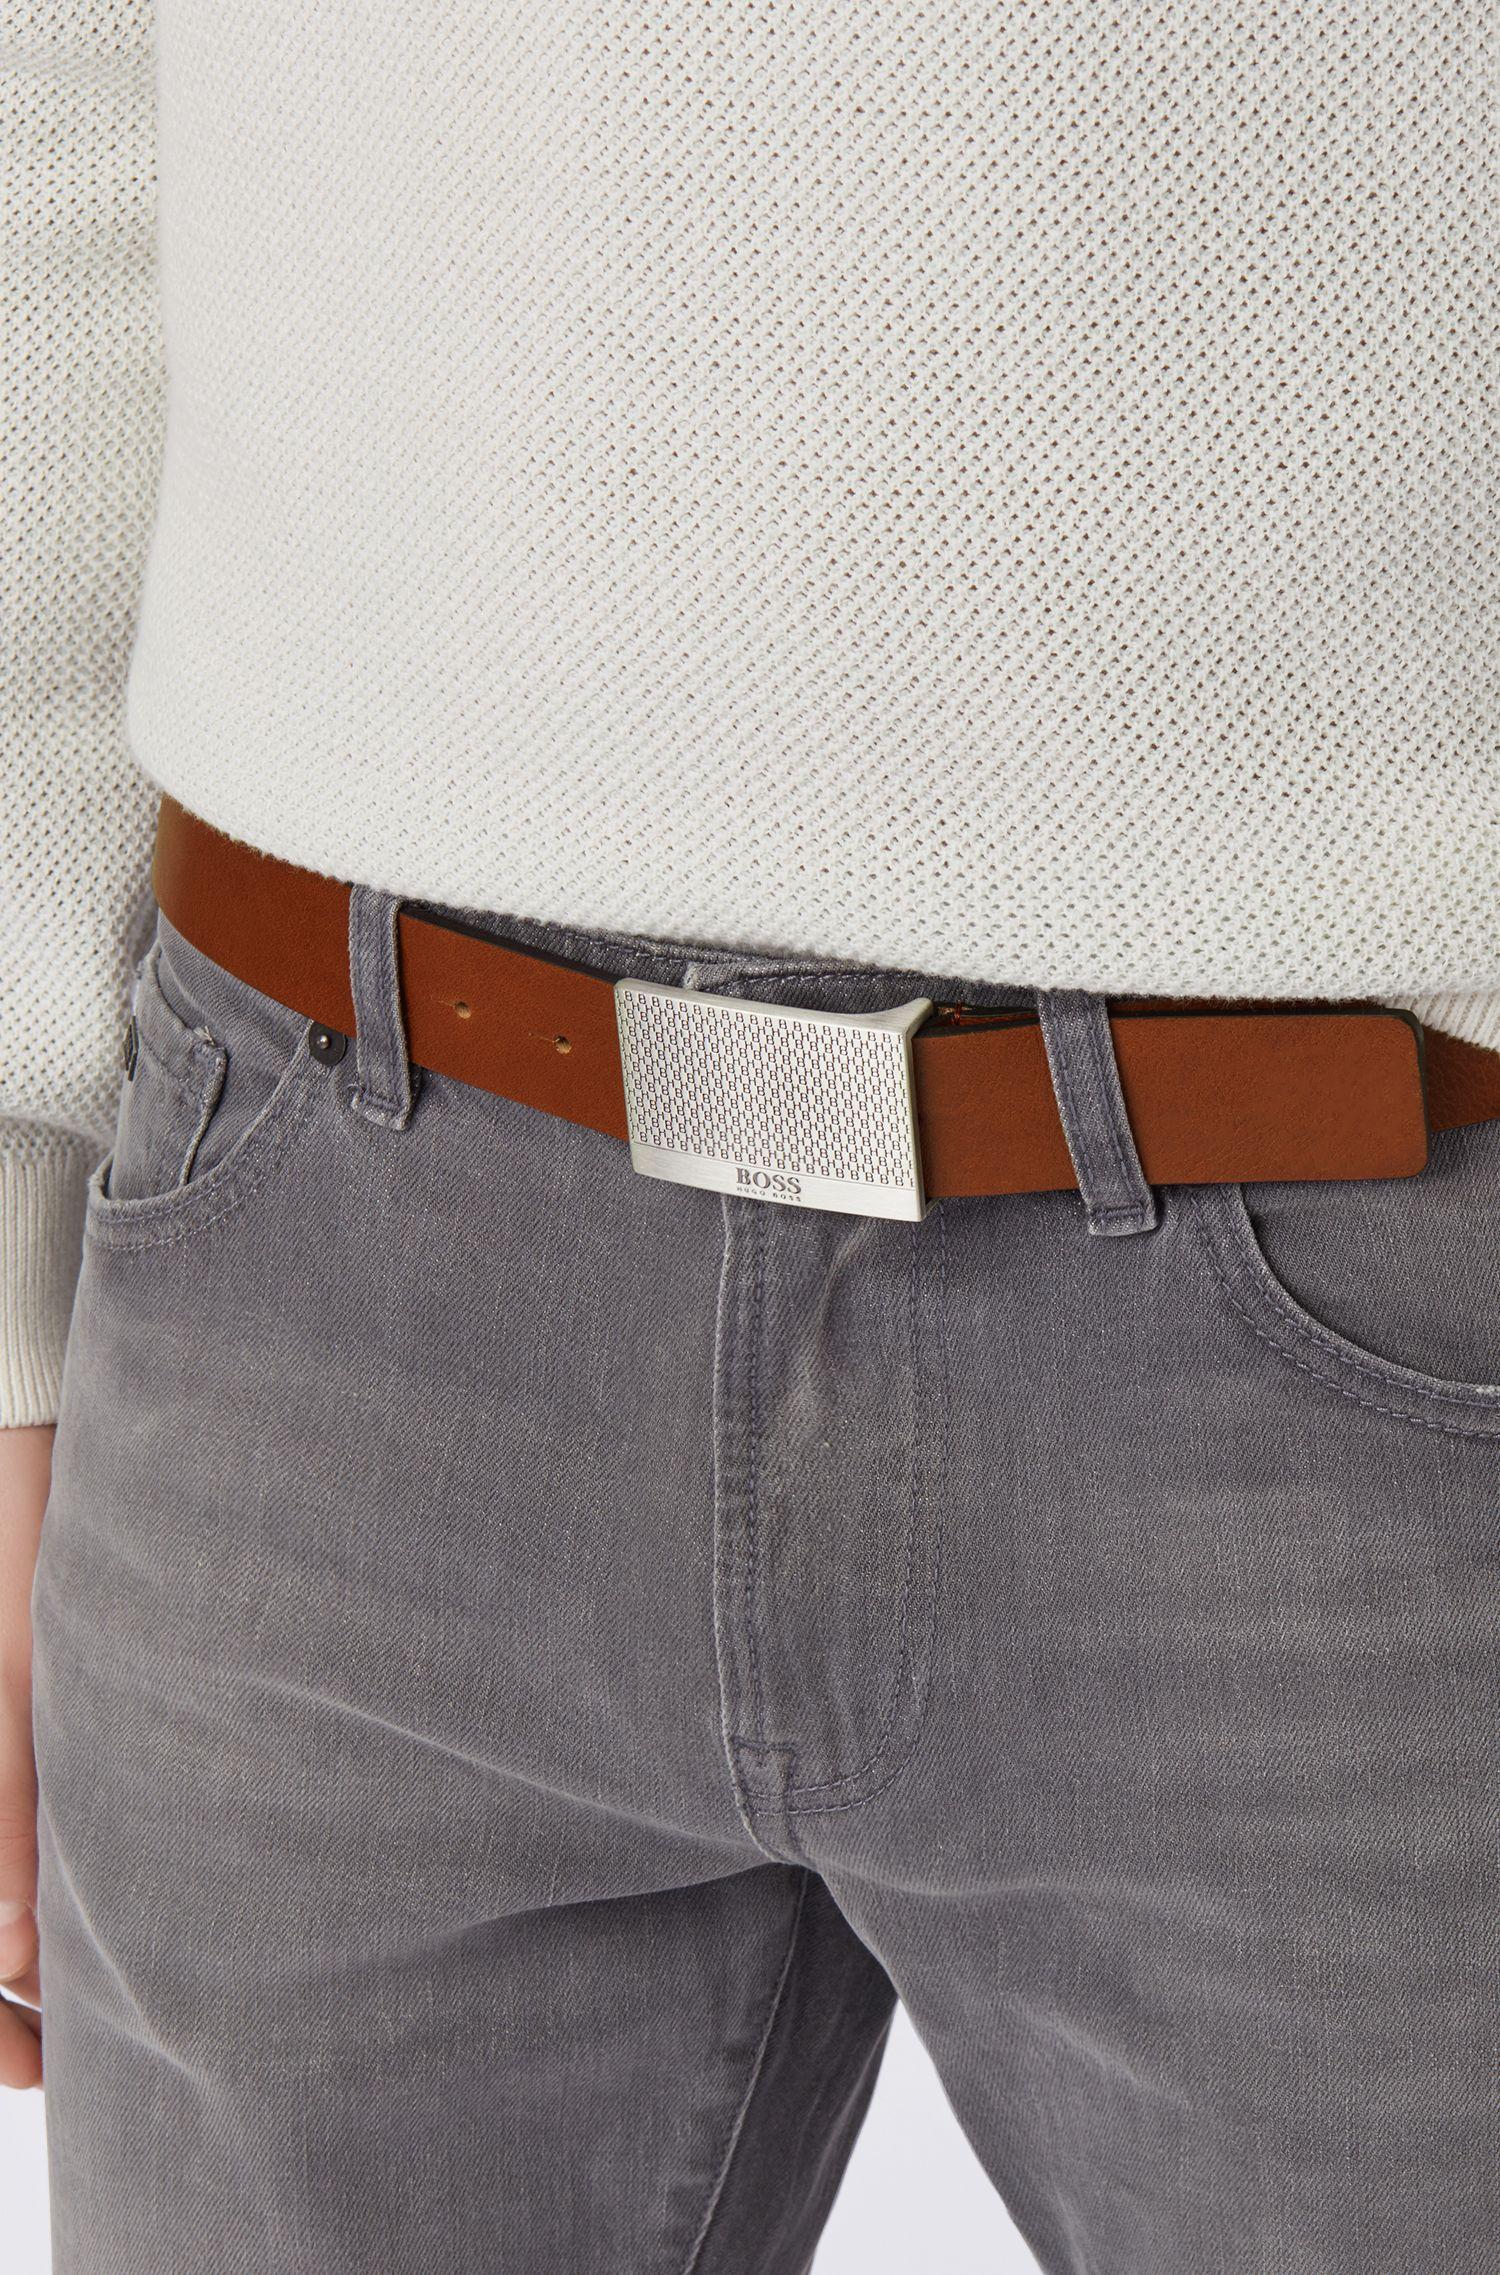 Hugo Boss - Ledergürtel mit Koppelschließe im Monogramm-Design - 4